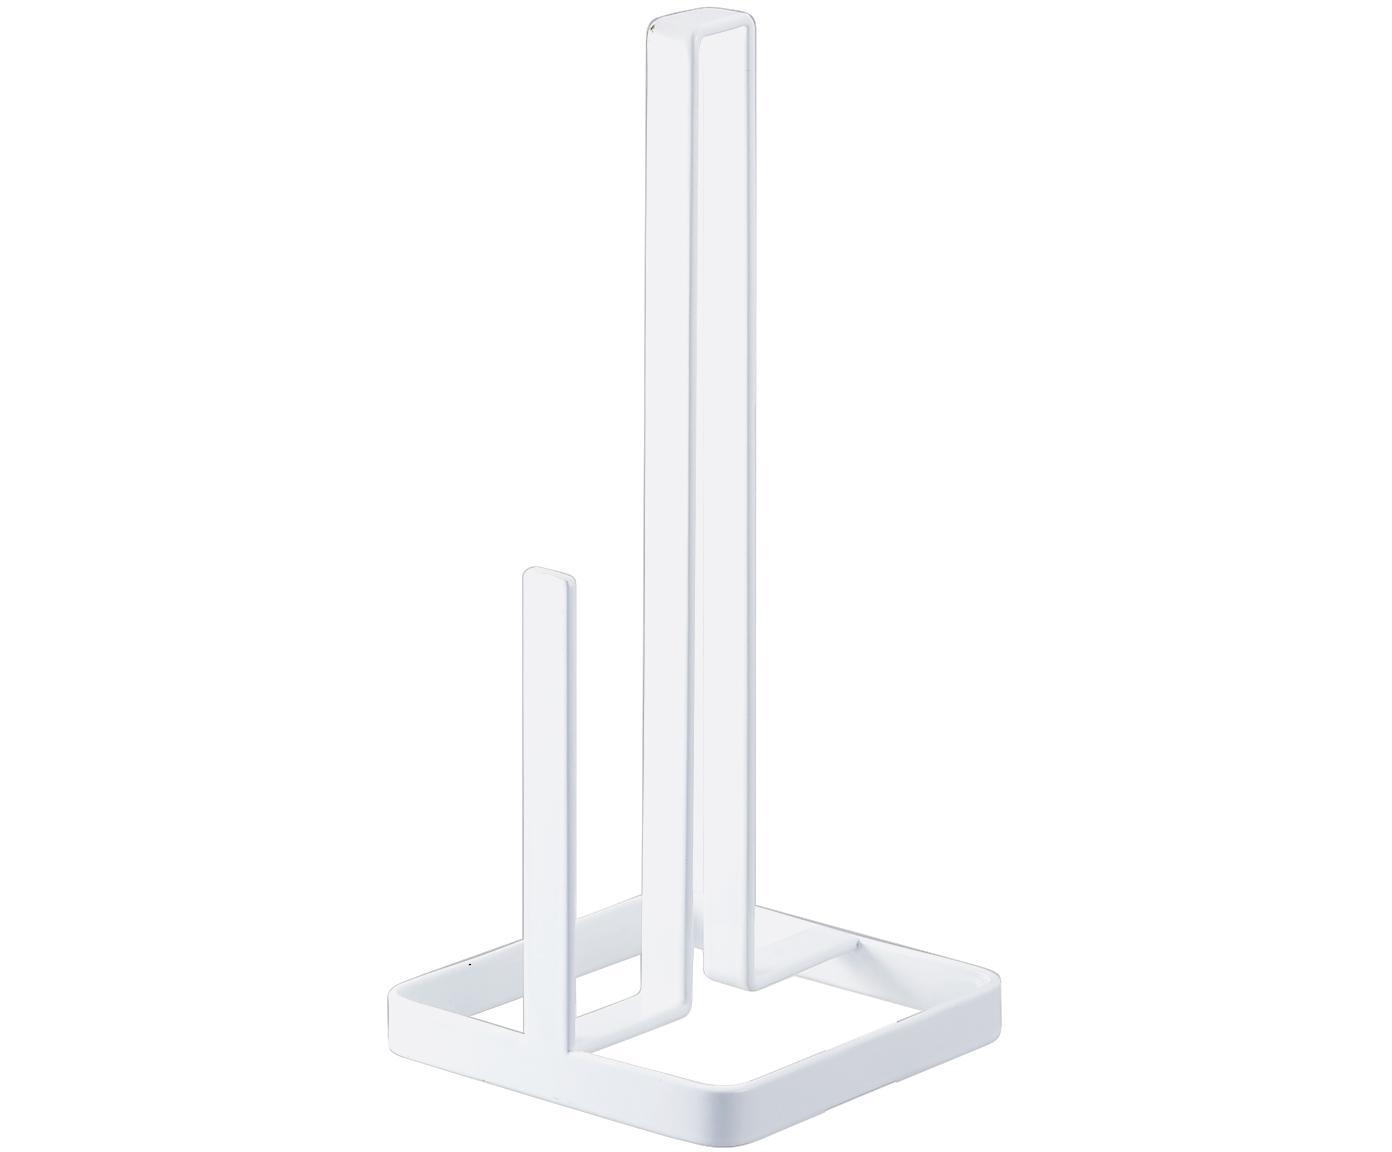 Keukenrolhouder Tower, Gecoat staal, Wit, 11 x 27 cm